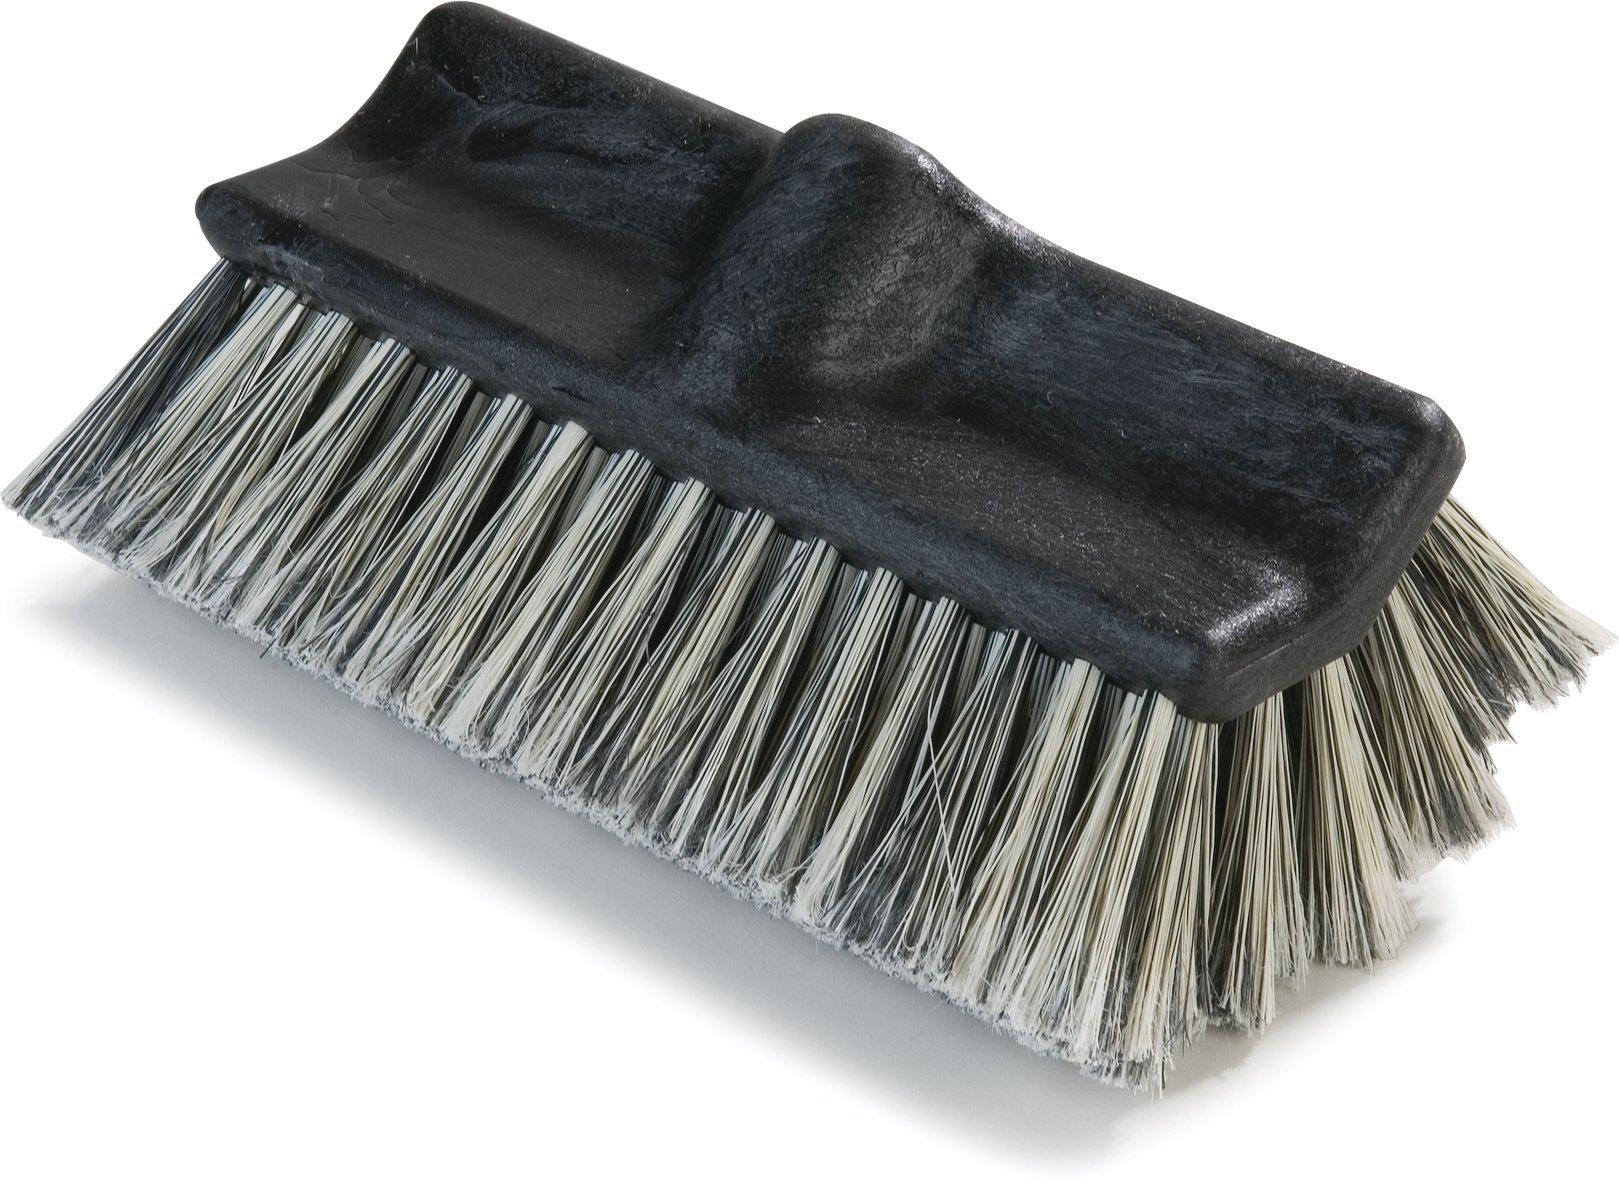 Carlisle 3649700 Flo-Pac Flo-Thru Dual Surface Brush, Plastic Foam Block, 2-1/2''-Long Flagged Polystyrene Bristles, 10'' L x 4-1/2'' W (Case of 12)